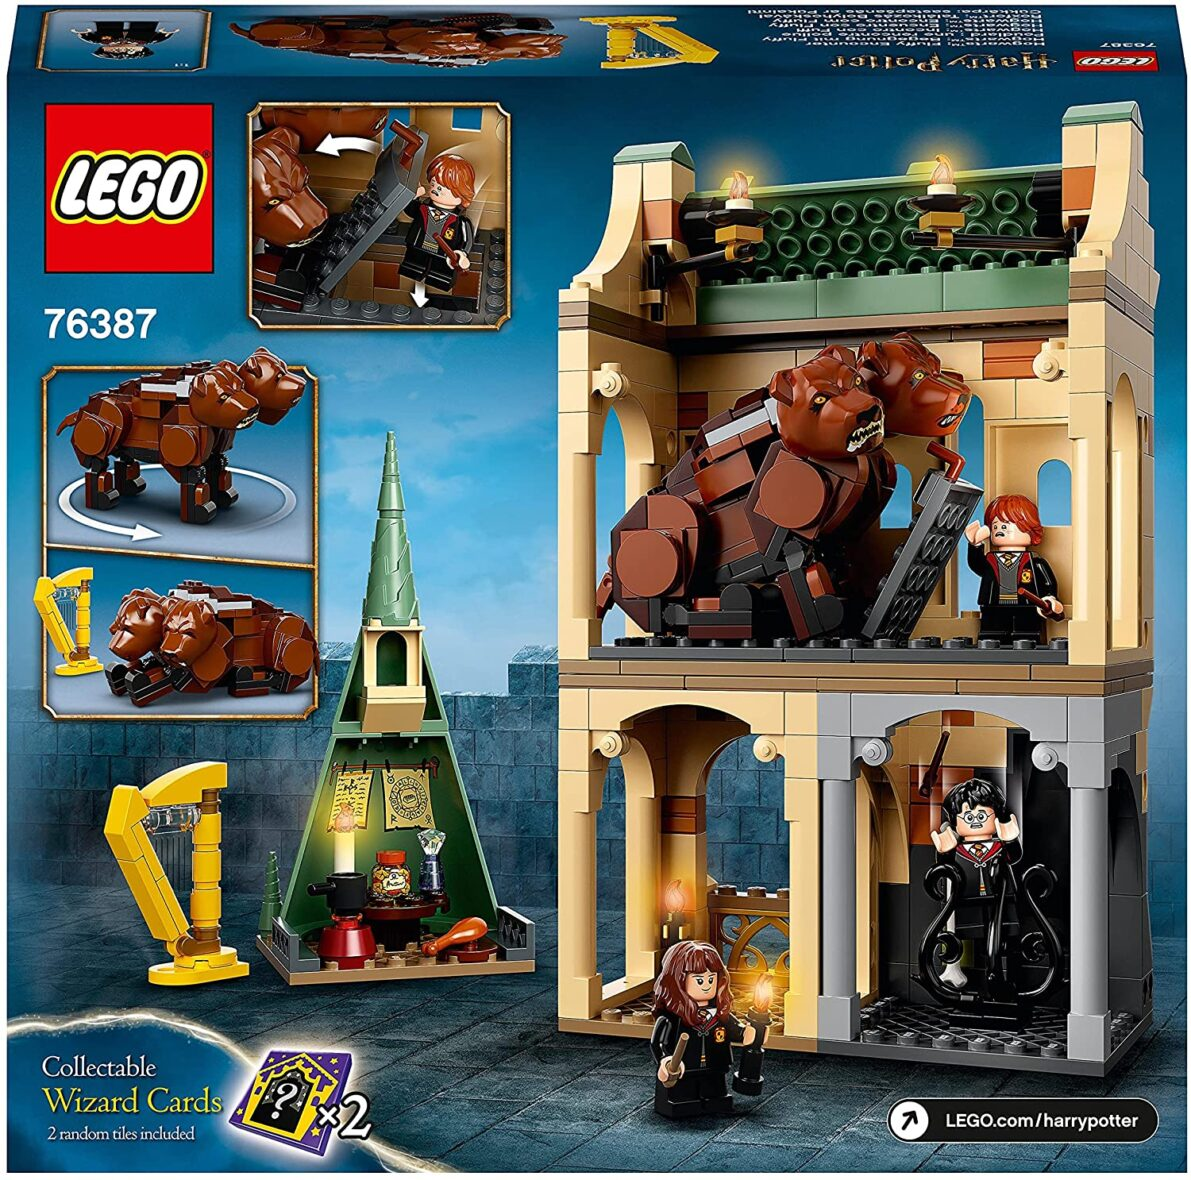 Lego Harry Potter Hogwarts: Intalnirea Cu Fluffy 76387